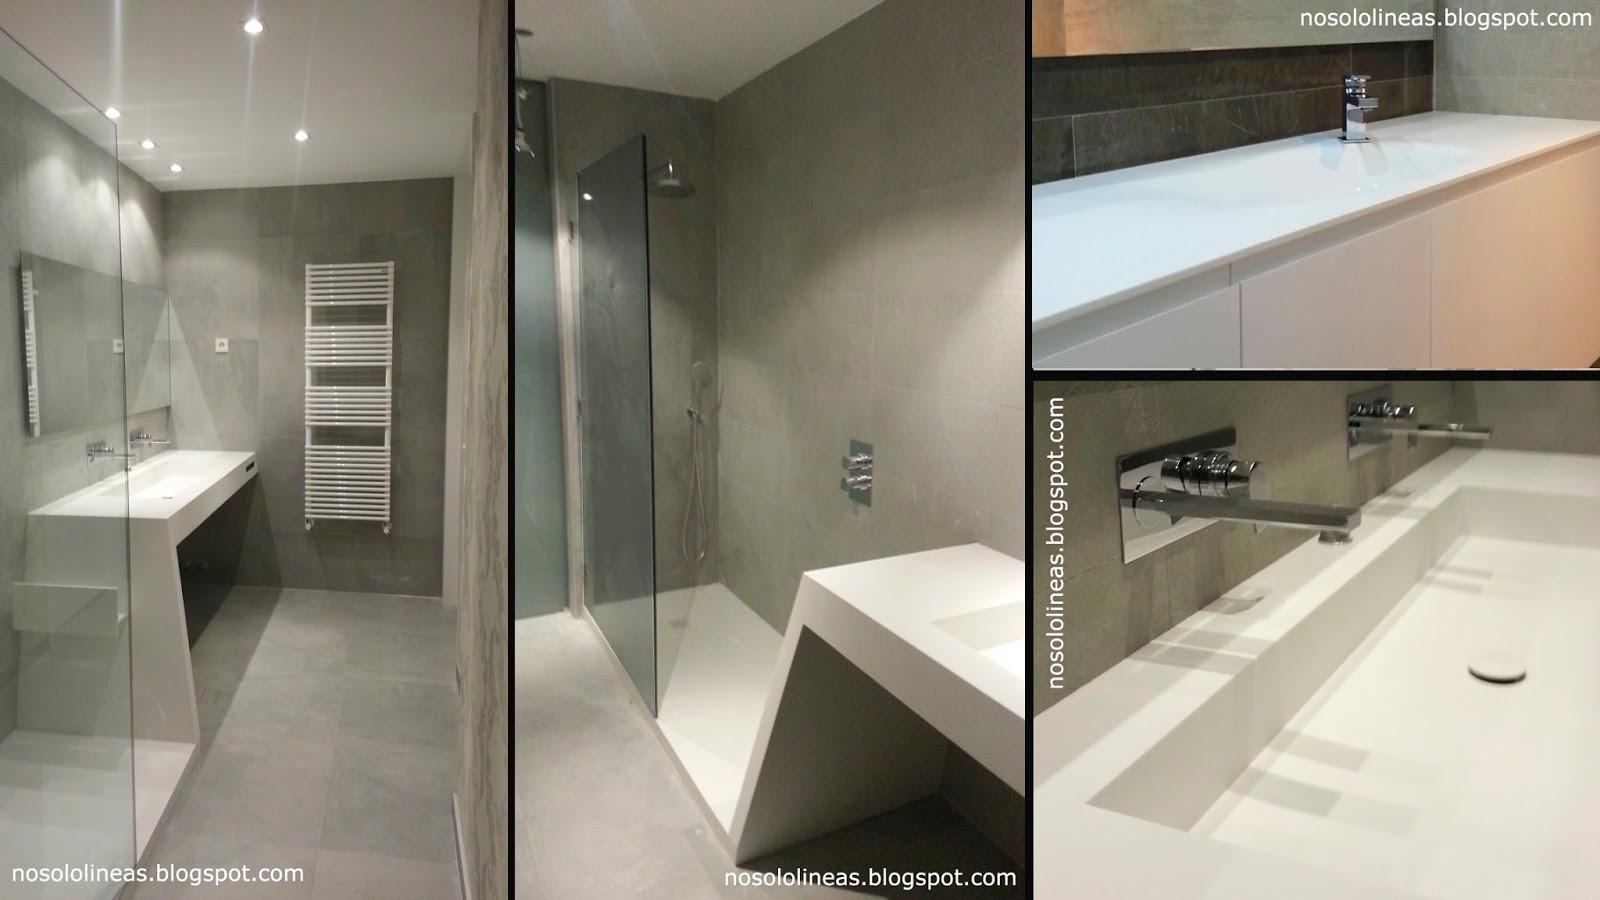 Platos de ducha corian stunning price for corian shower - Plato ducha corian ...